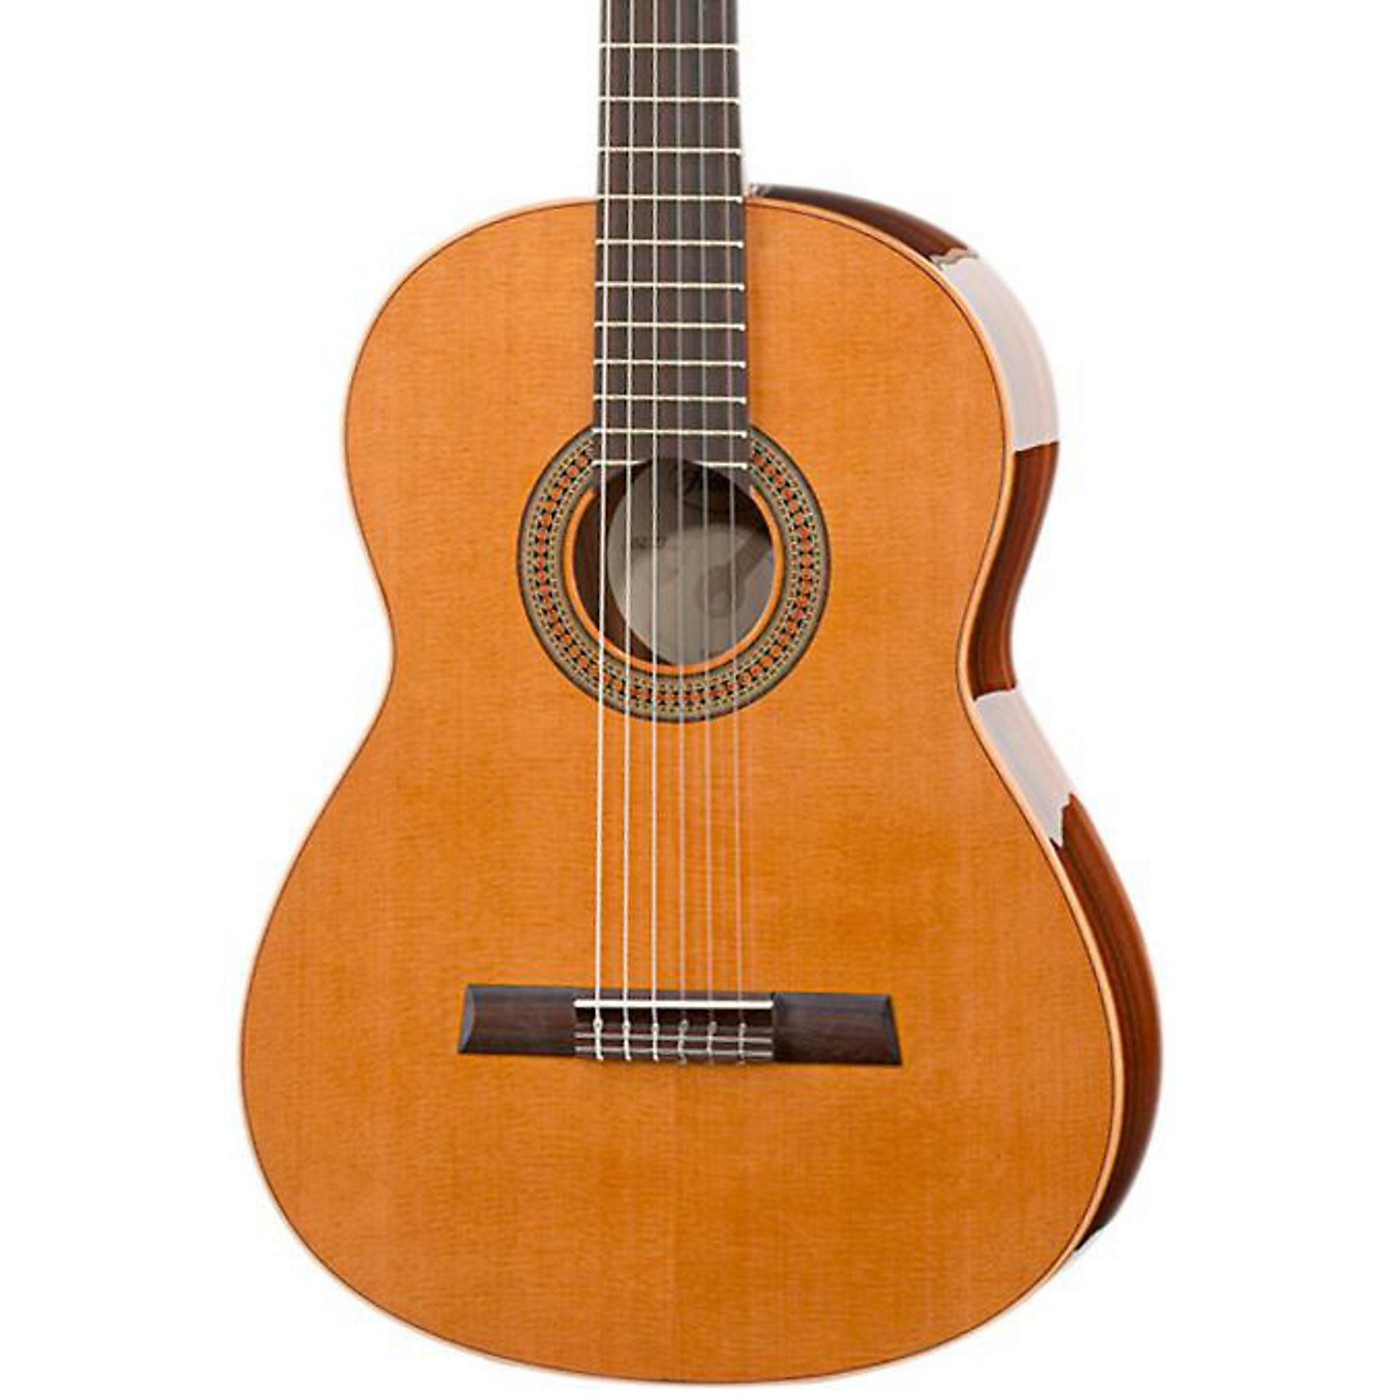 Hofner Solid Cedar Top Rosewood Body Classical Acoustic Guitar thumbnail